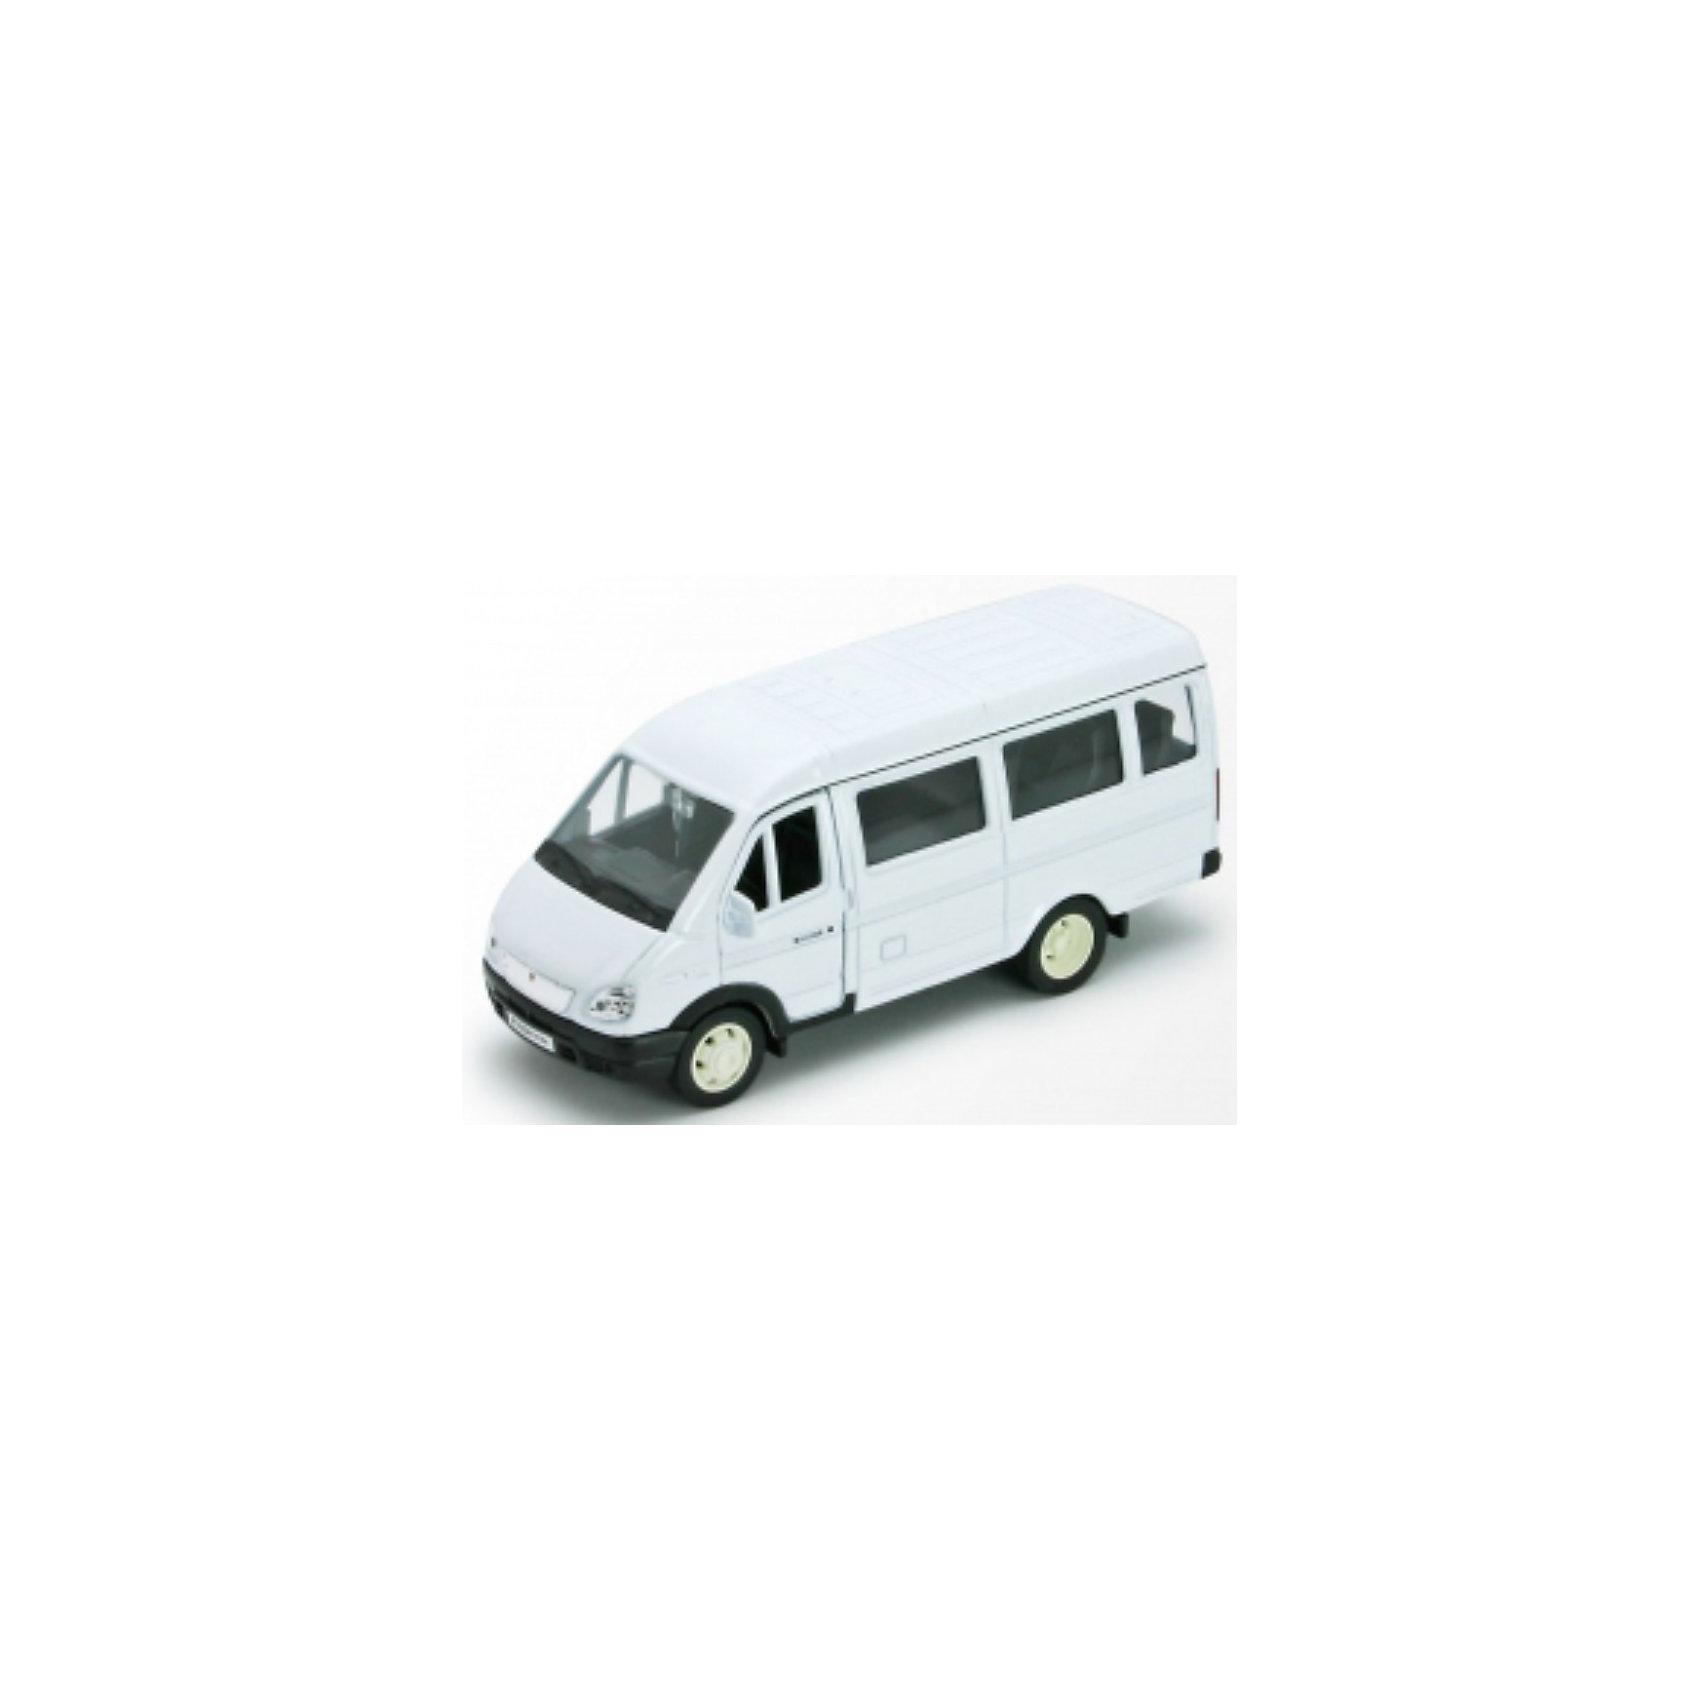 Welly Welly Модель машины ГАЗель пассажирская машинки welly игрушка модель машины автокран